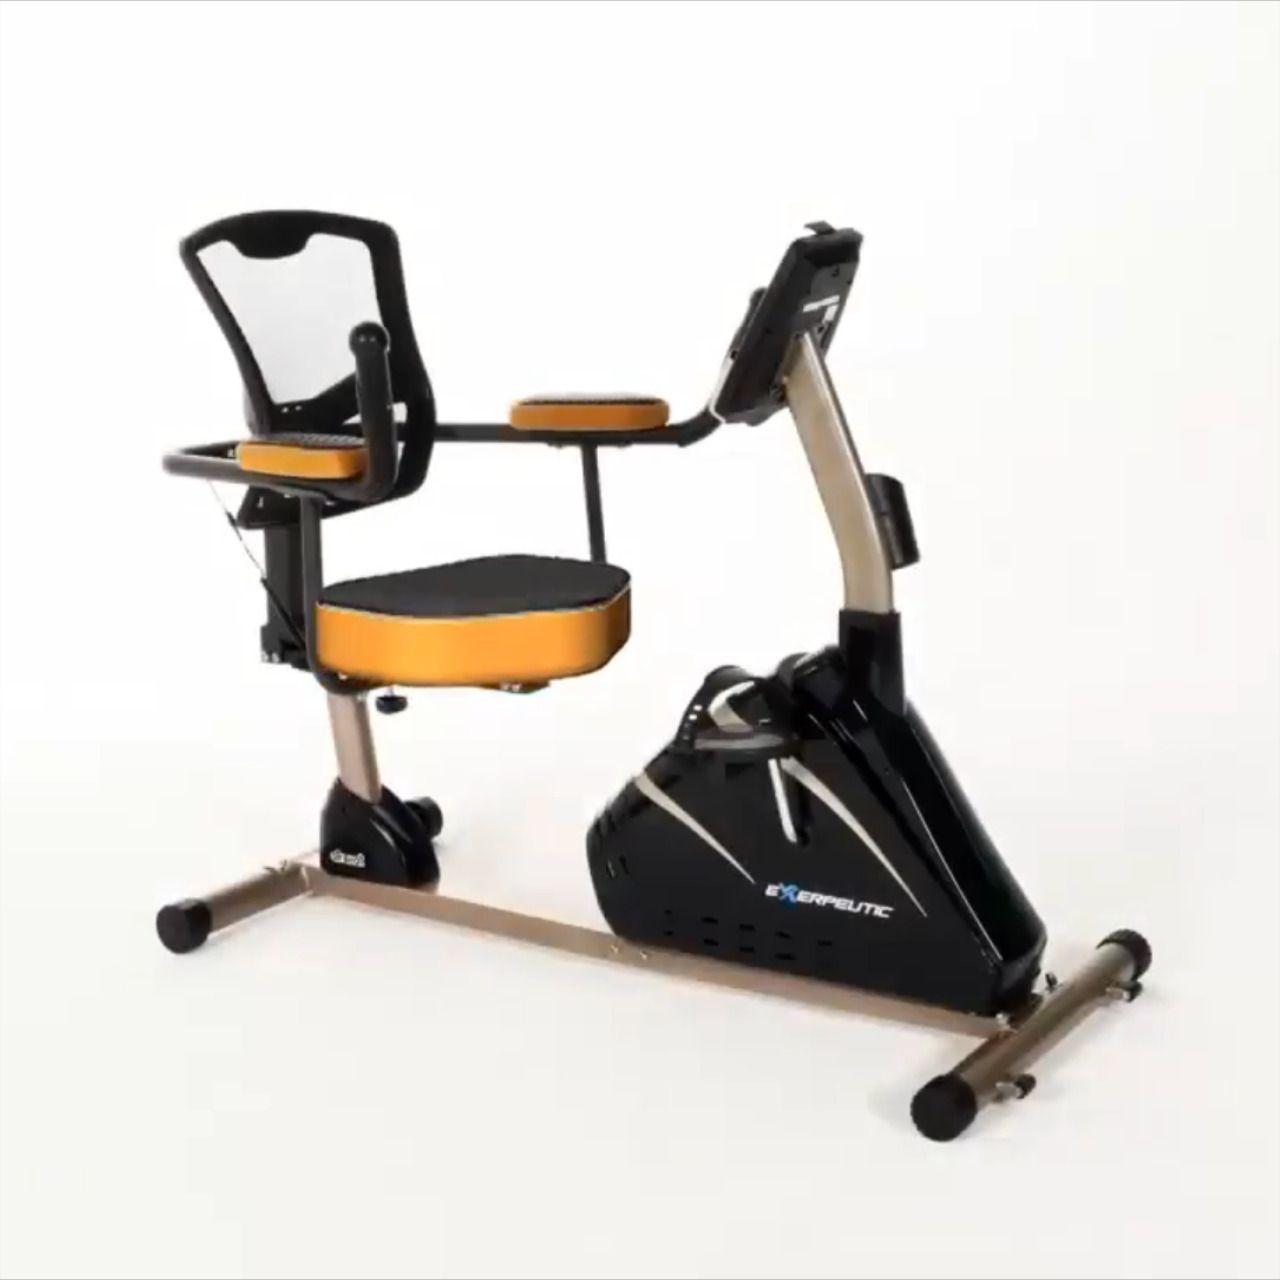 Fan Exercise Bicycle Bicycle Workout Bike Recumbent Bike Workout